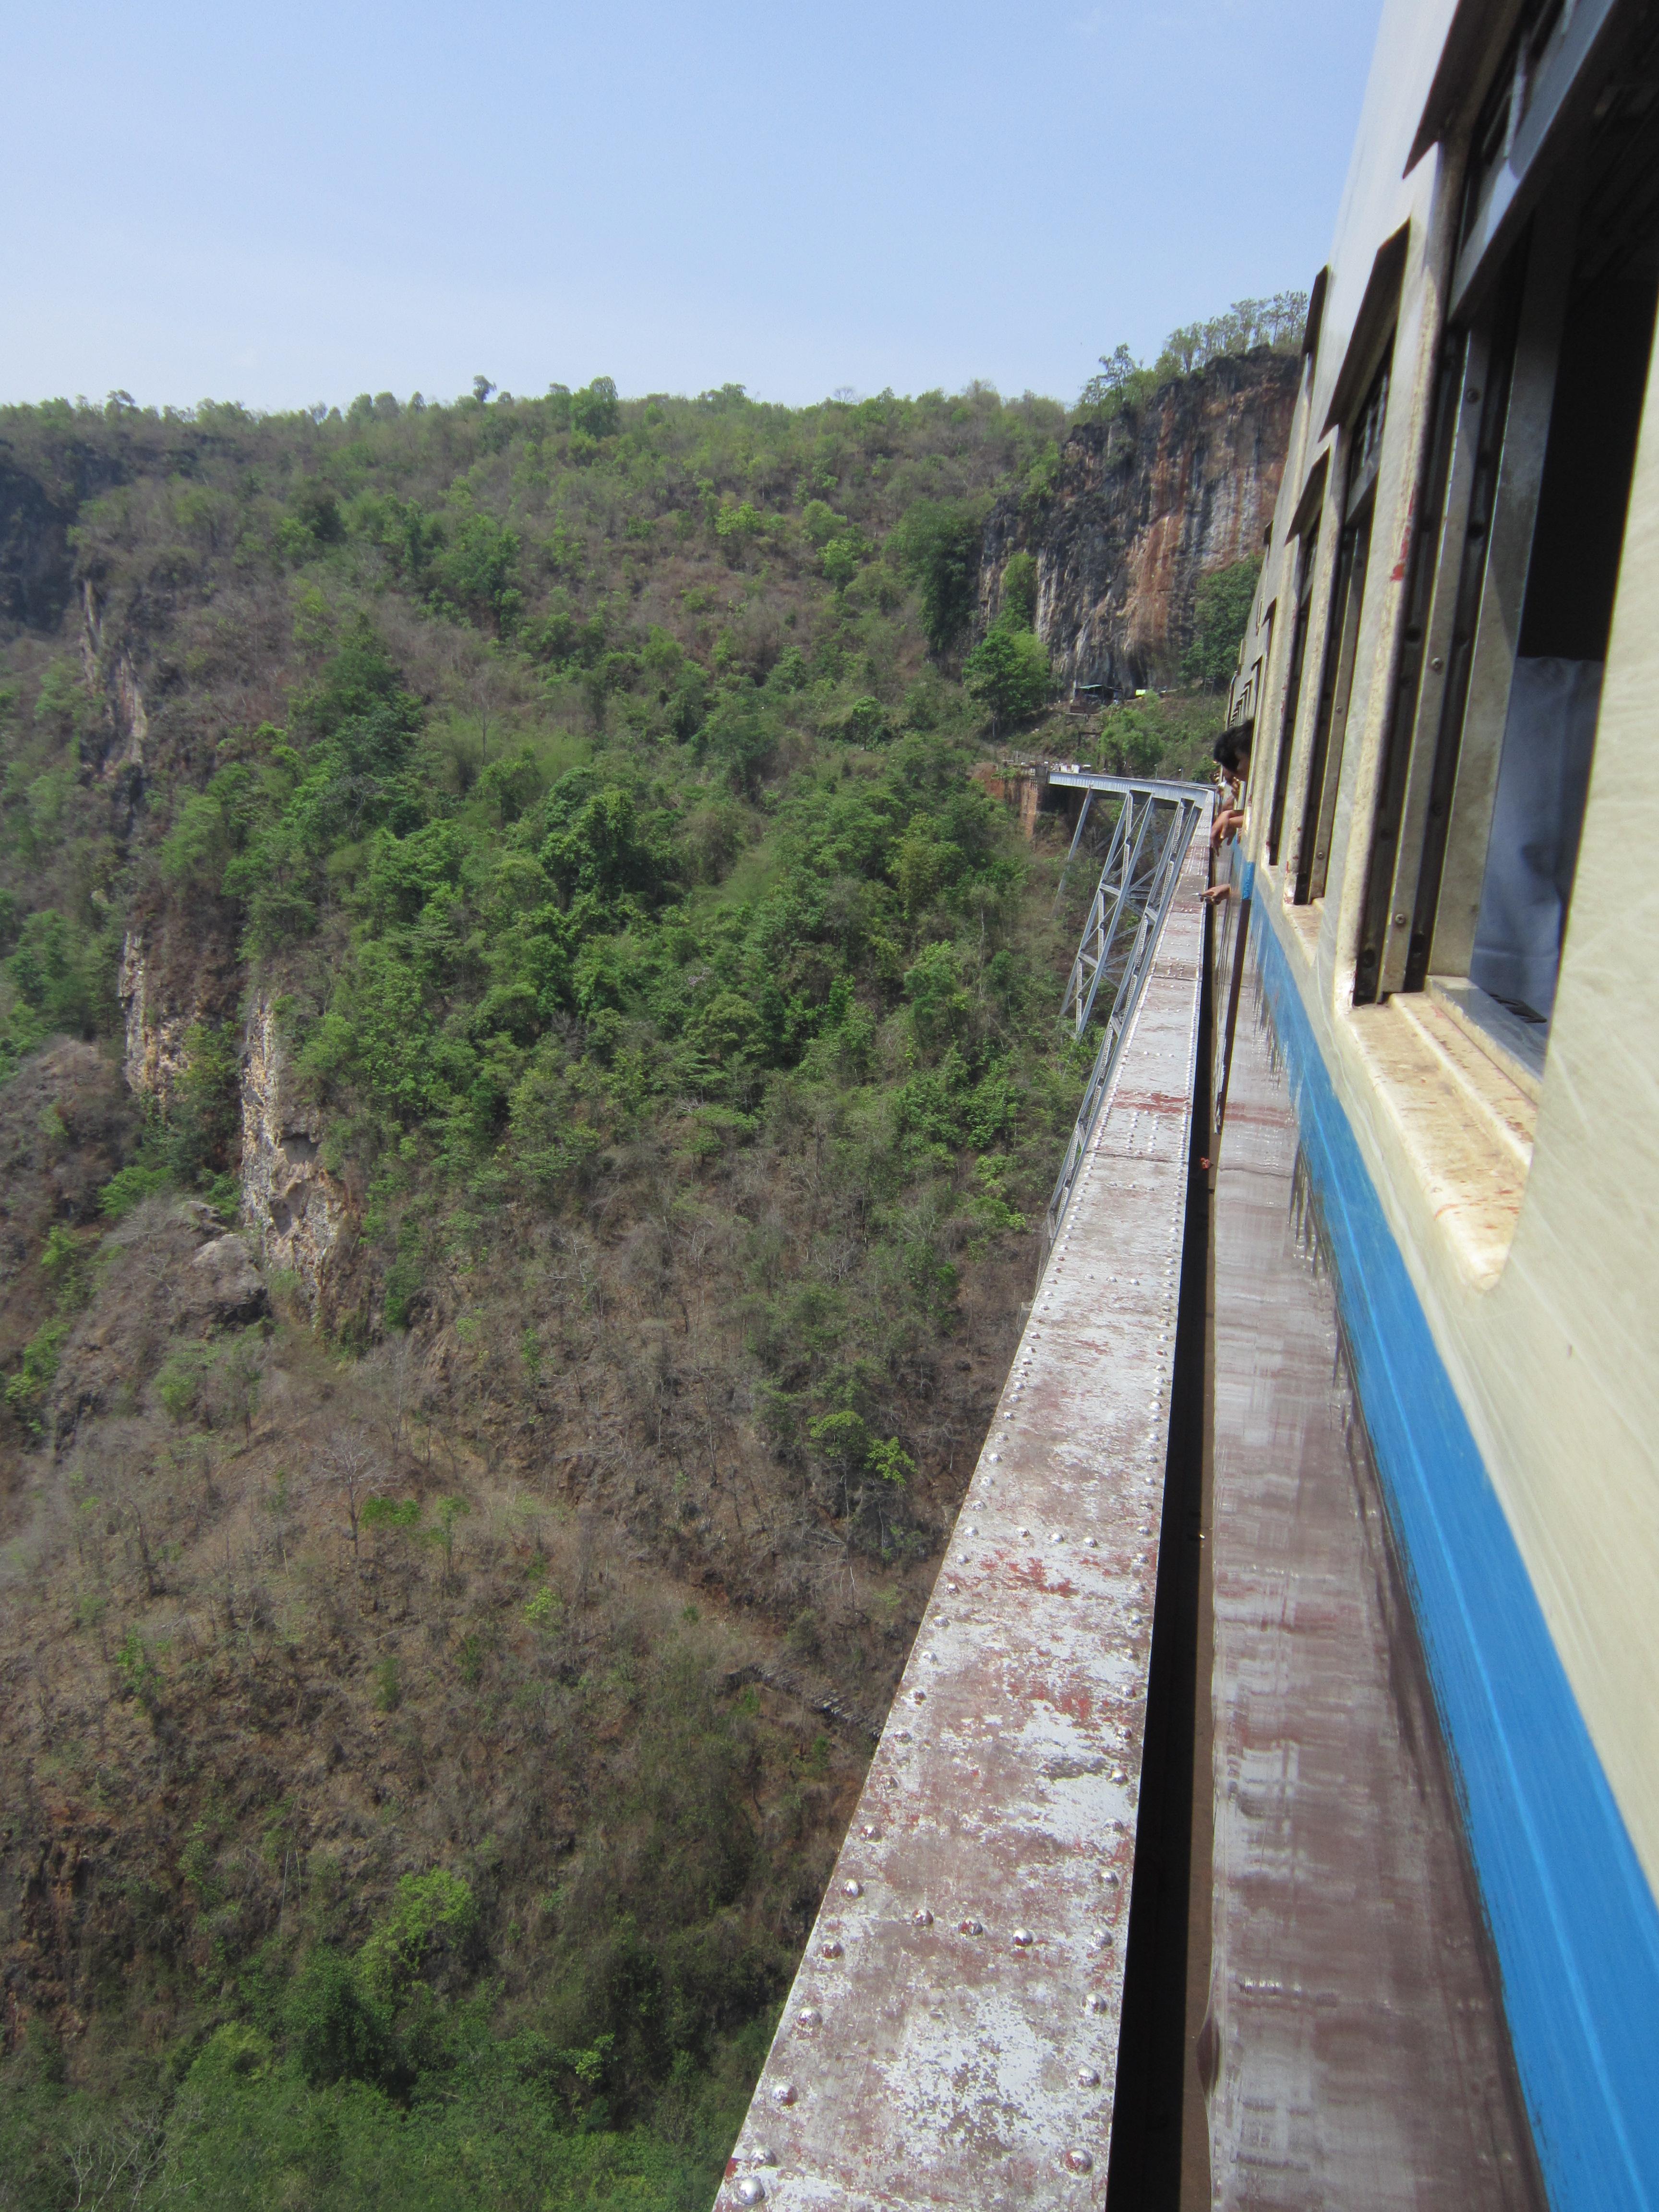 Crossing Gokteik Viaduct by train on route to Pyin Oo Lwin